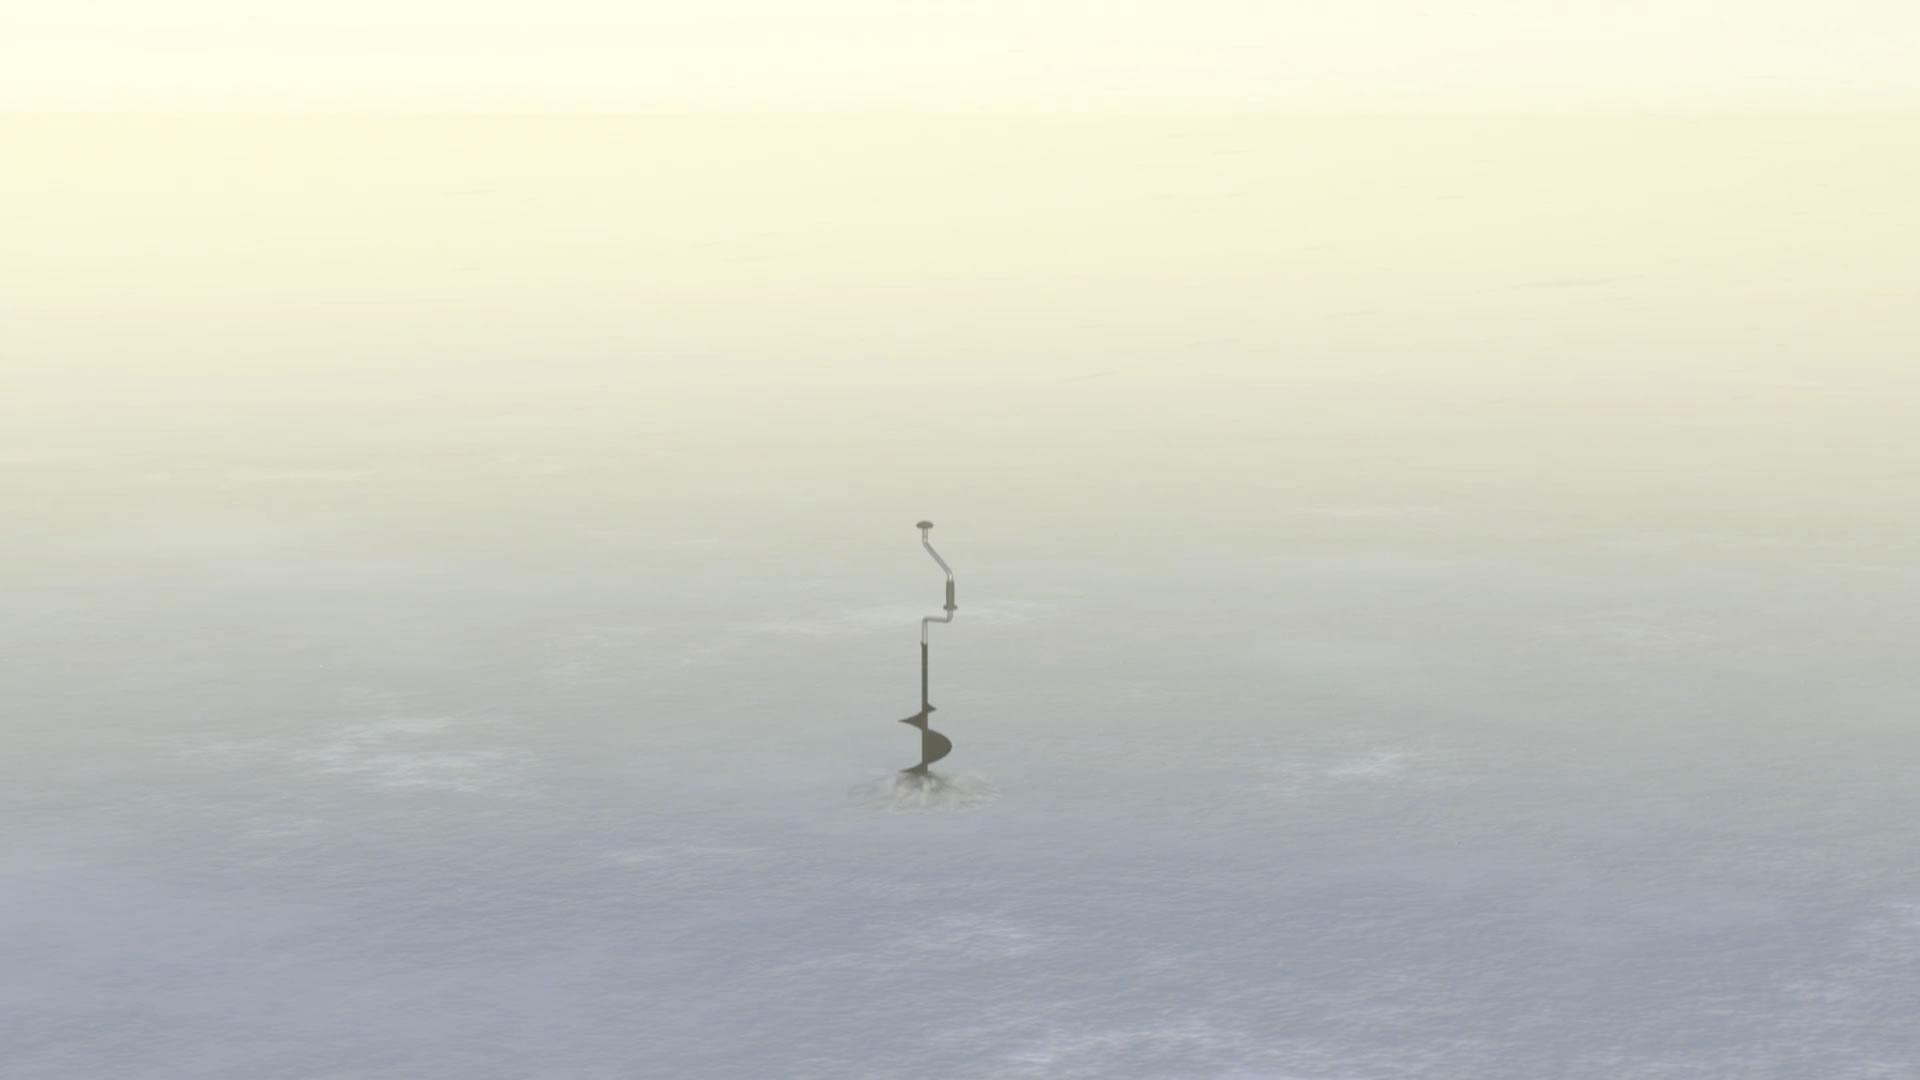 Drilling ice fishing holes.